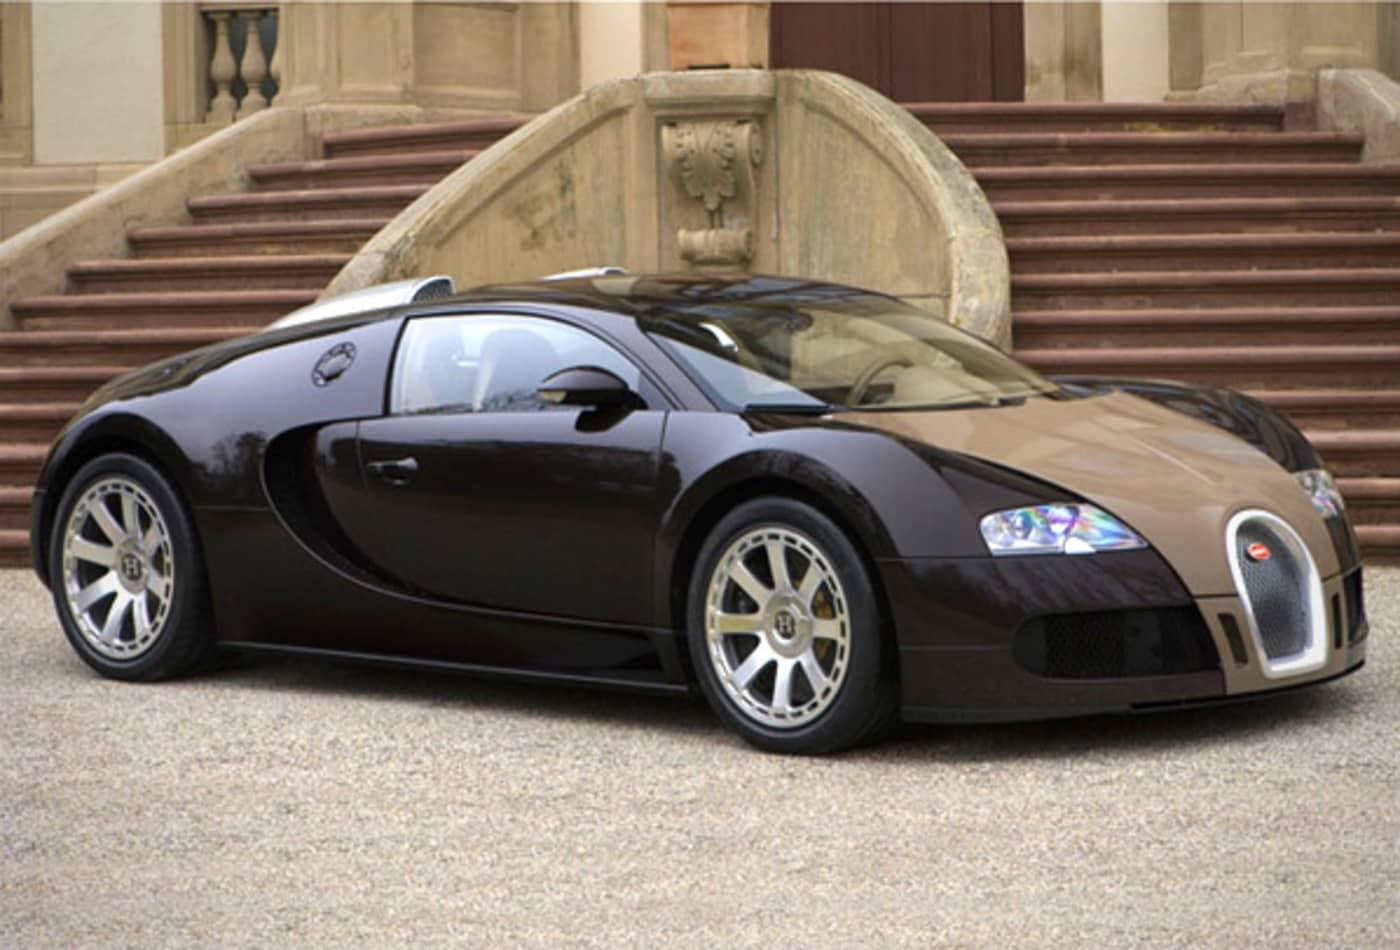 SS_Biggest_Gas_Guzzlers_Bugatti_Veyron.jpg